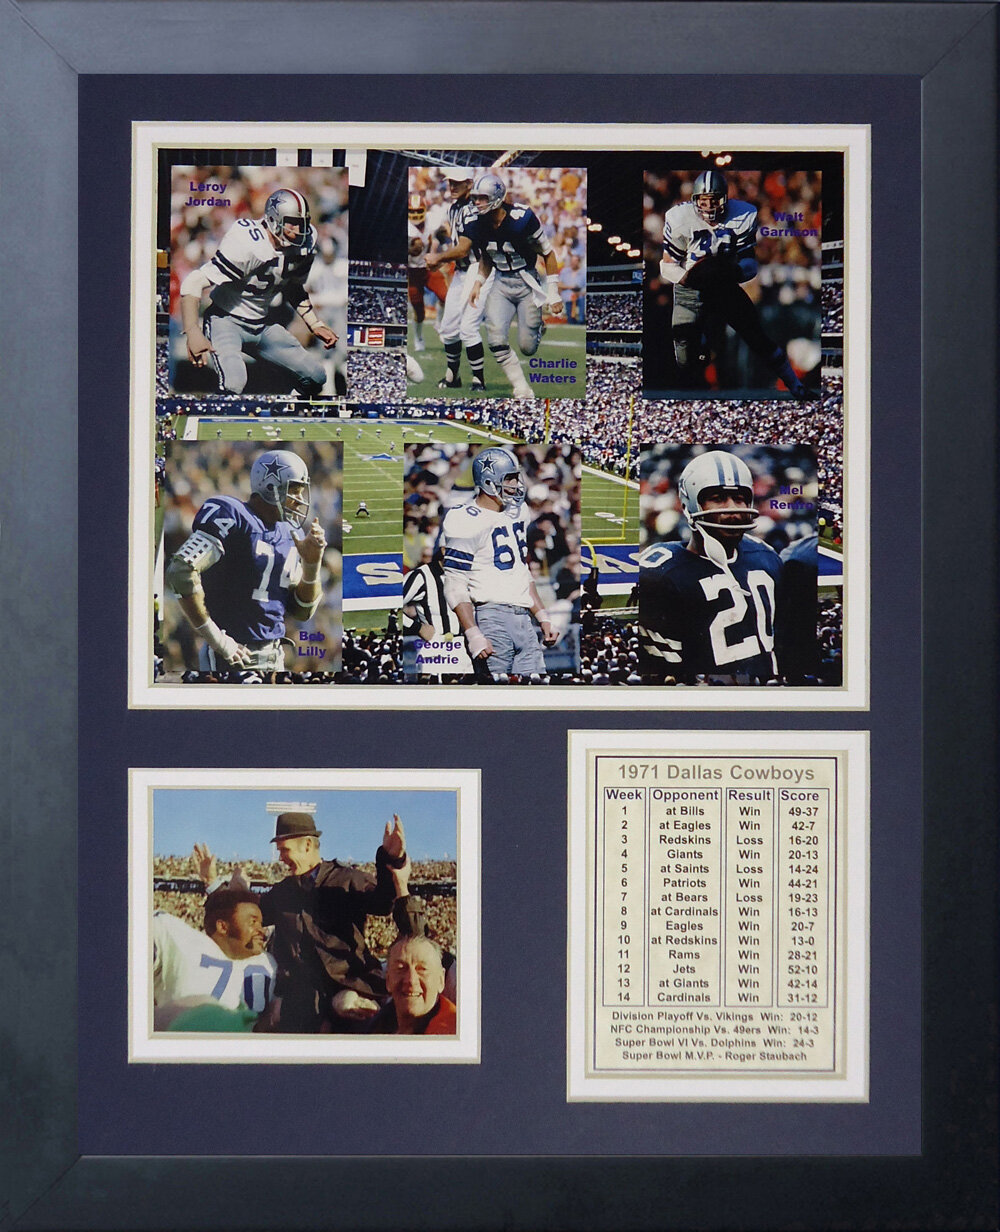 Legends Never Die Dallas Cowboys 1971 Champs Framed Memorabili